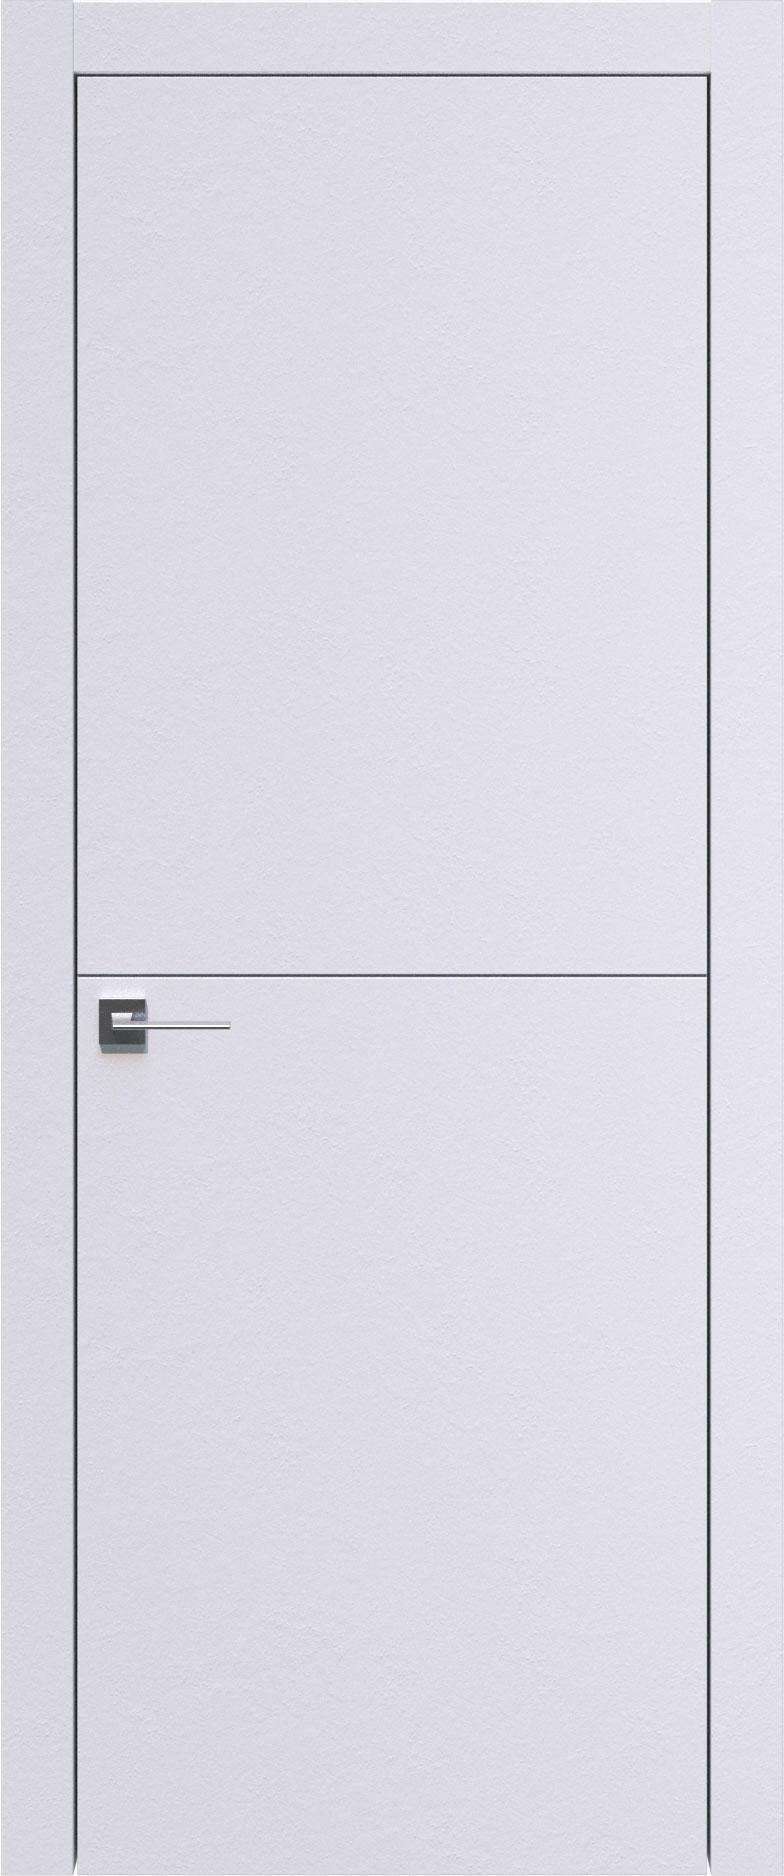 Tivoli Б-2 цвет - Арктик белый Без стекла (ДГ)